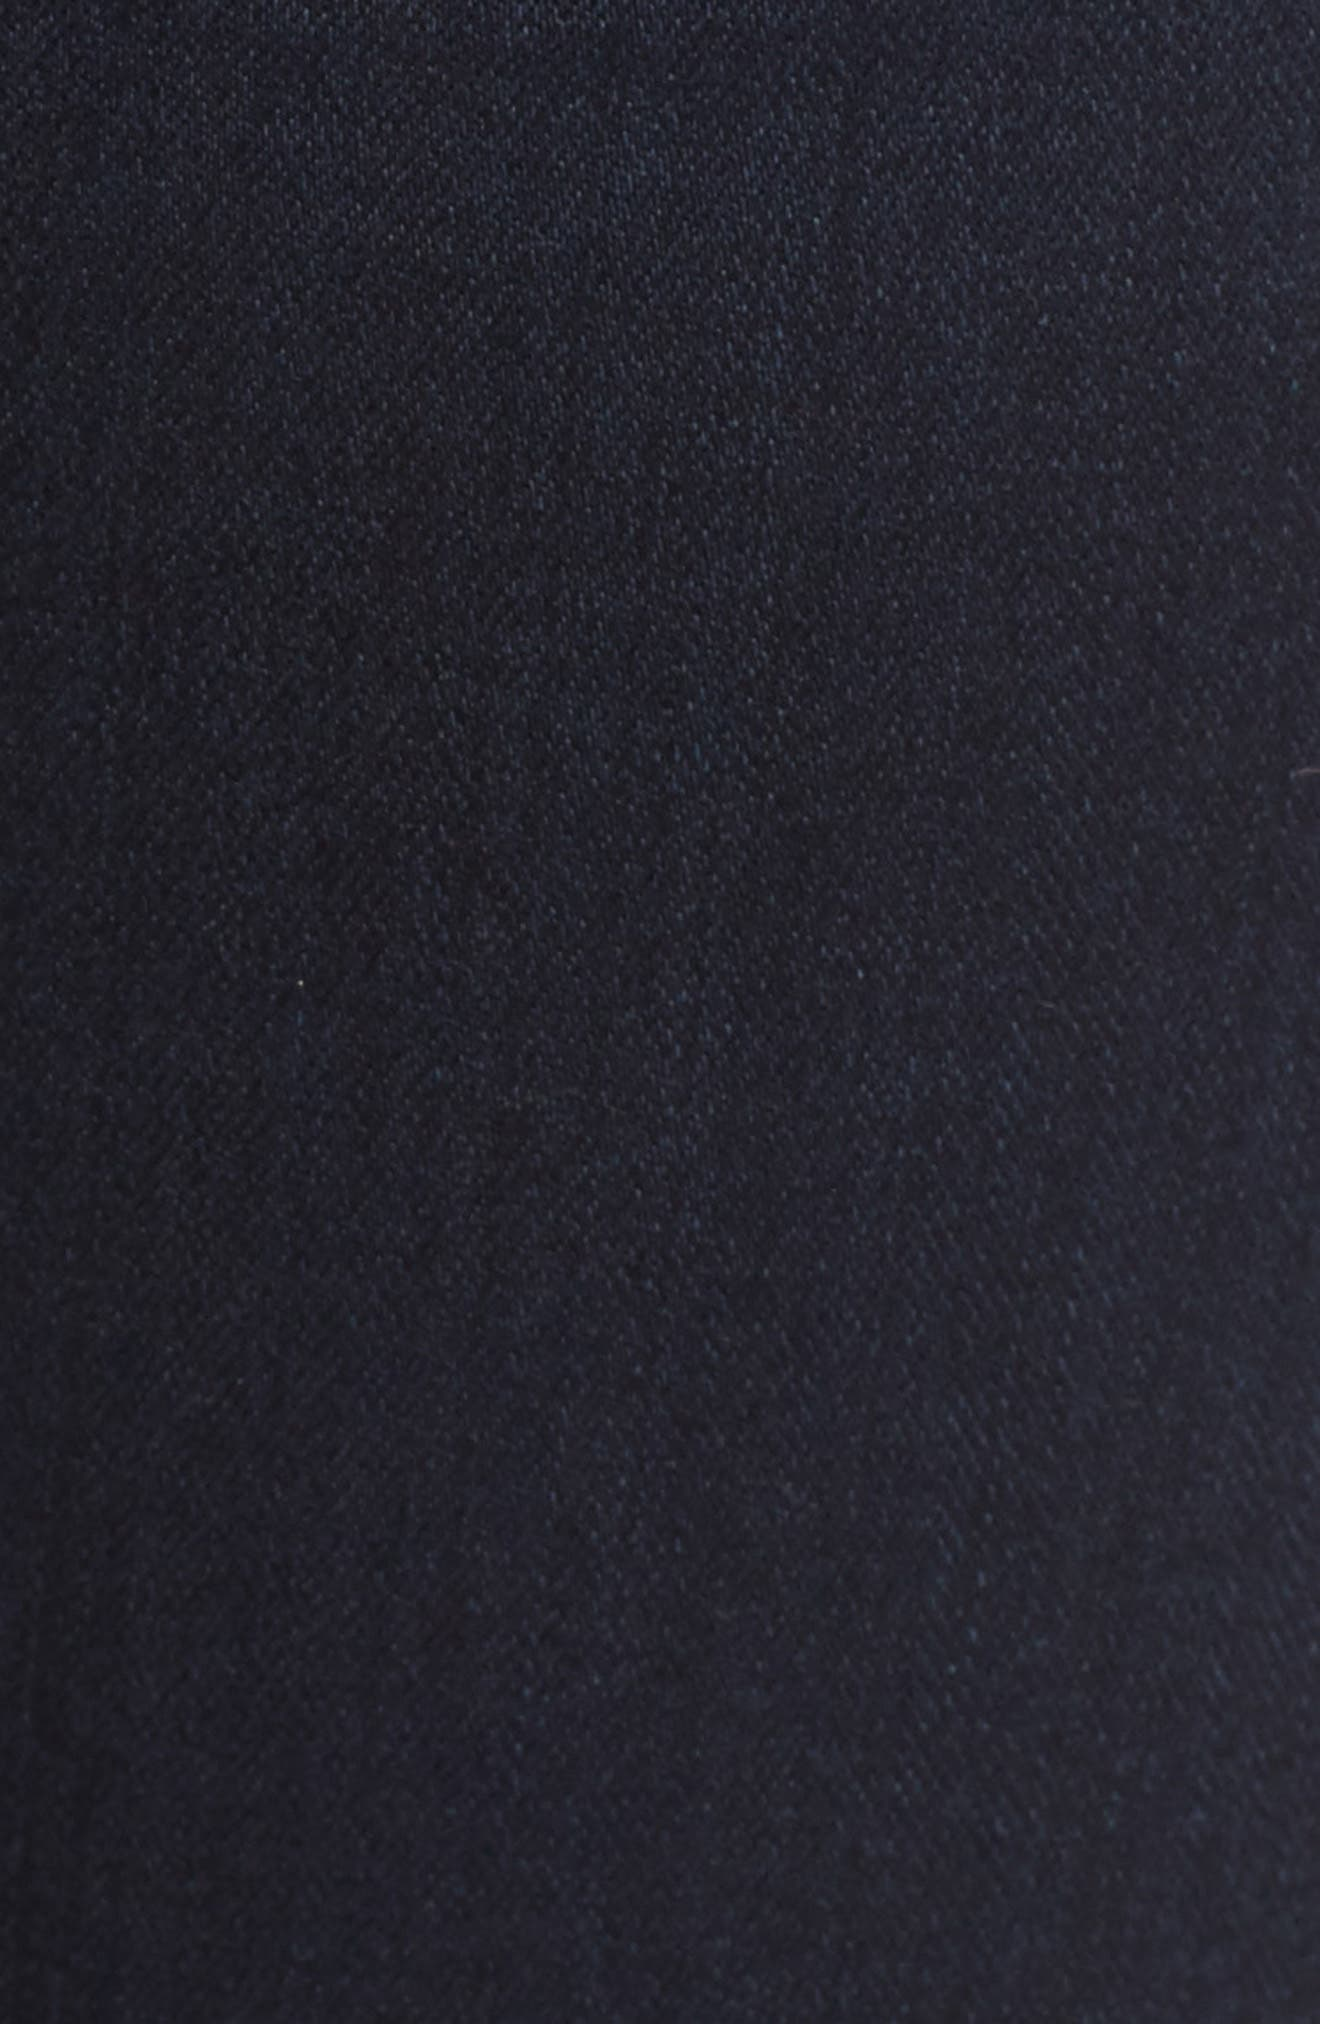 Manhattan High Waist Bootcut Jeans,                             Alternate thumbnail 10, color,